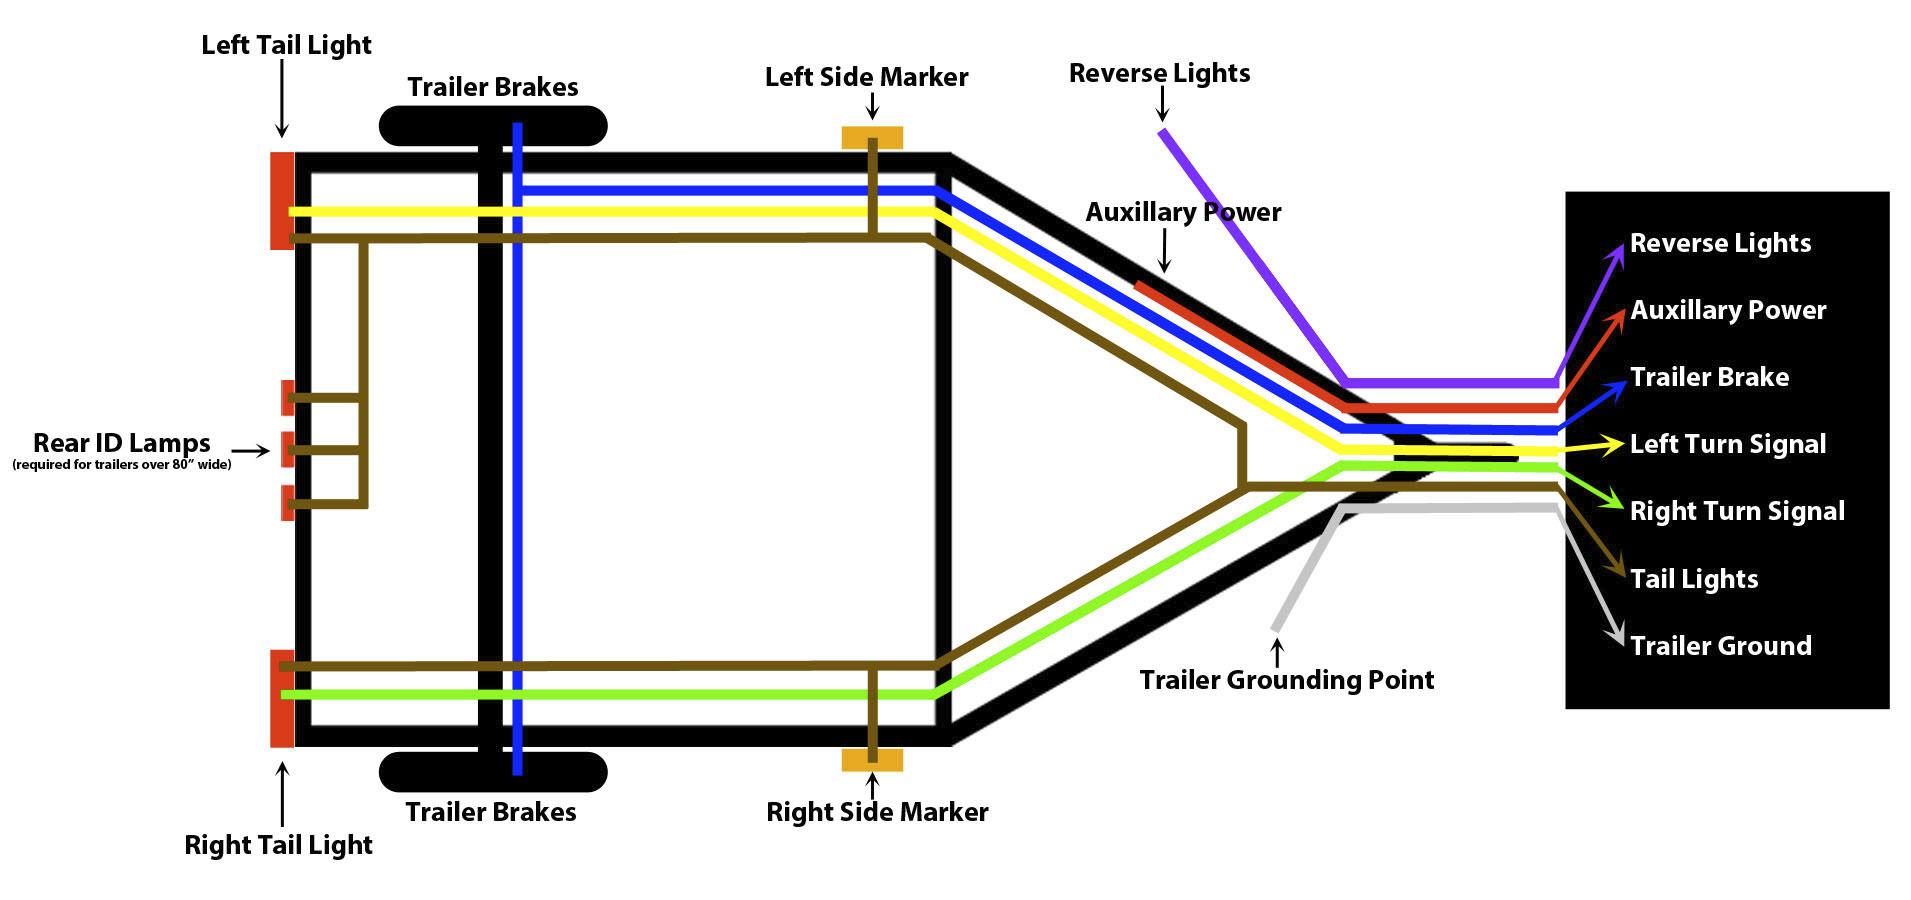 Warner Trailer Plug Wiring Diagram - Wiring Diagram Online - Wiring Diagram For Trailer Lights